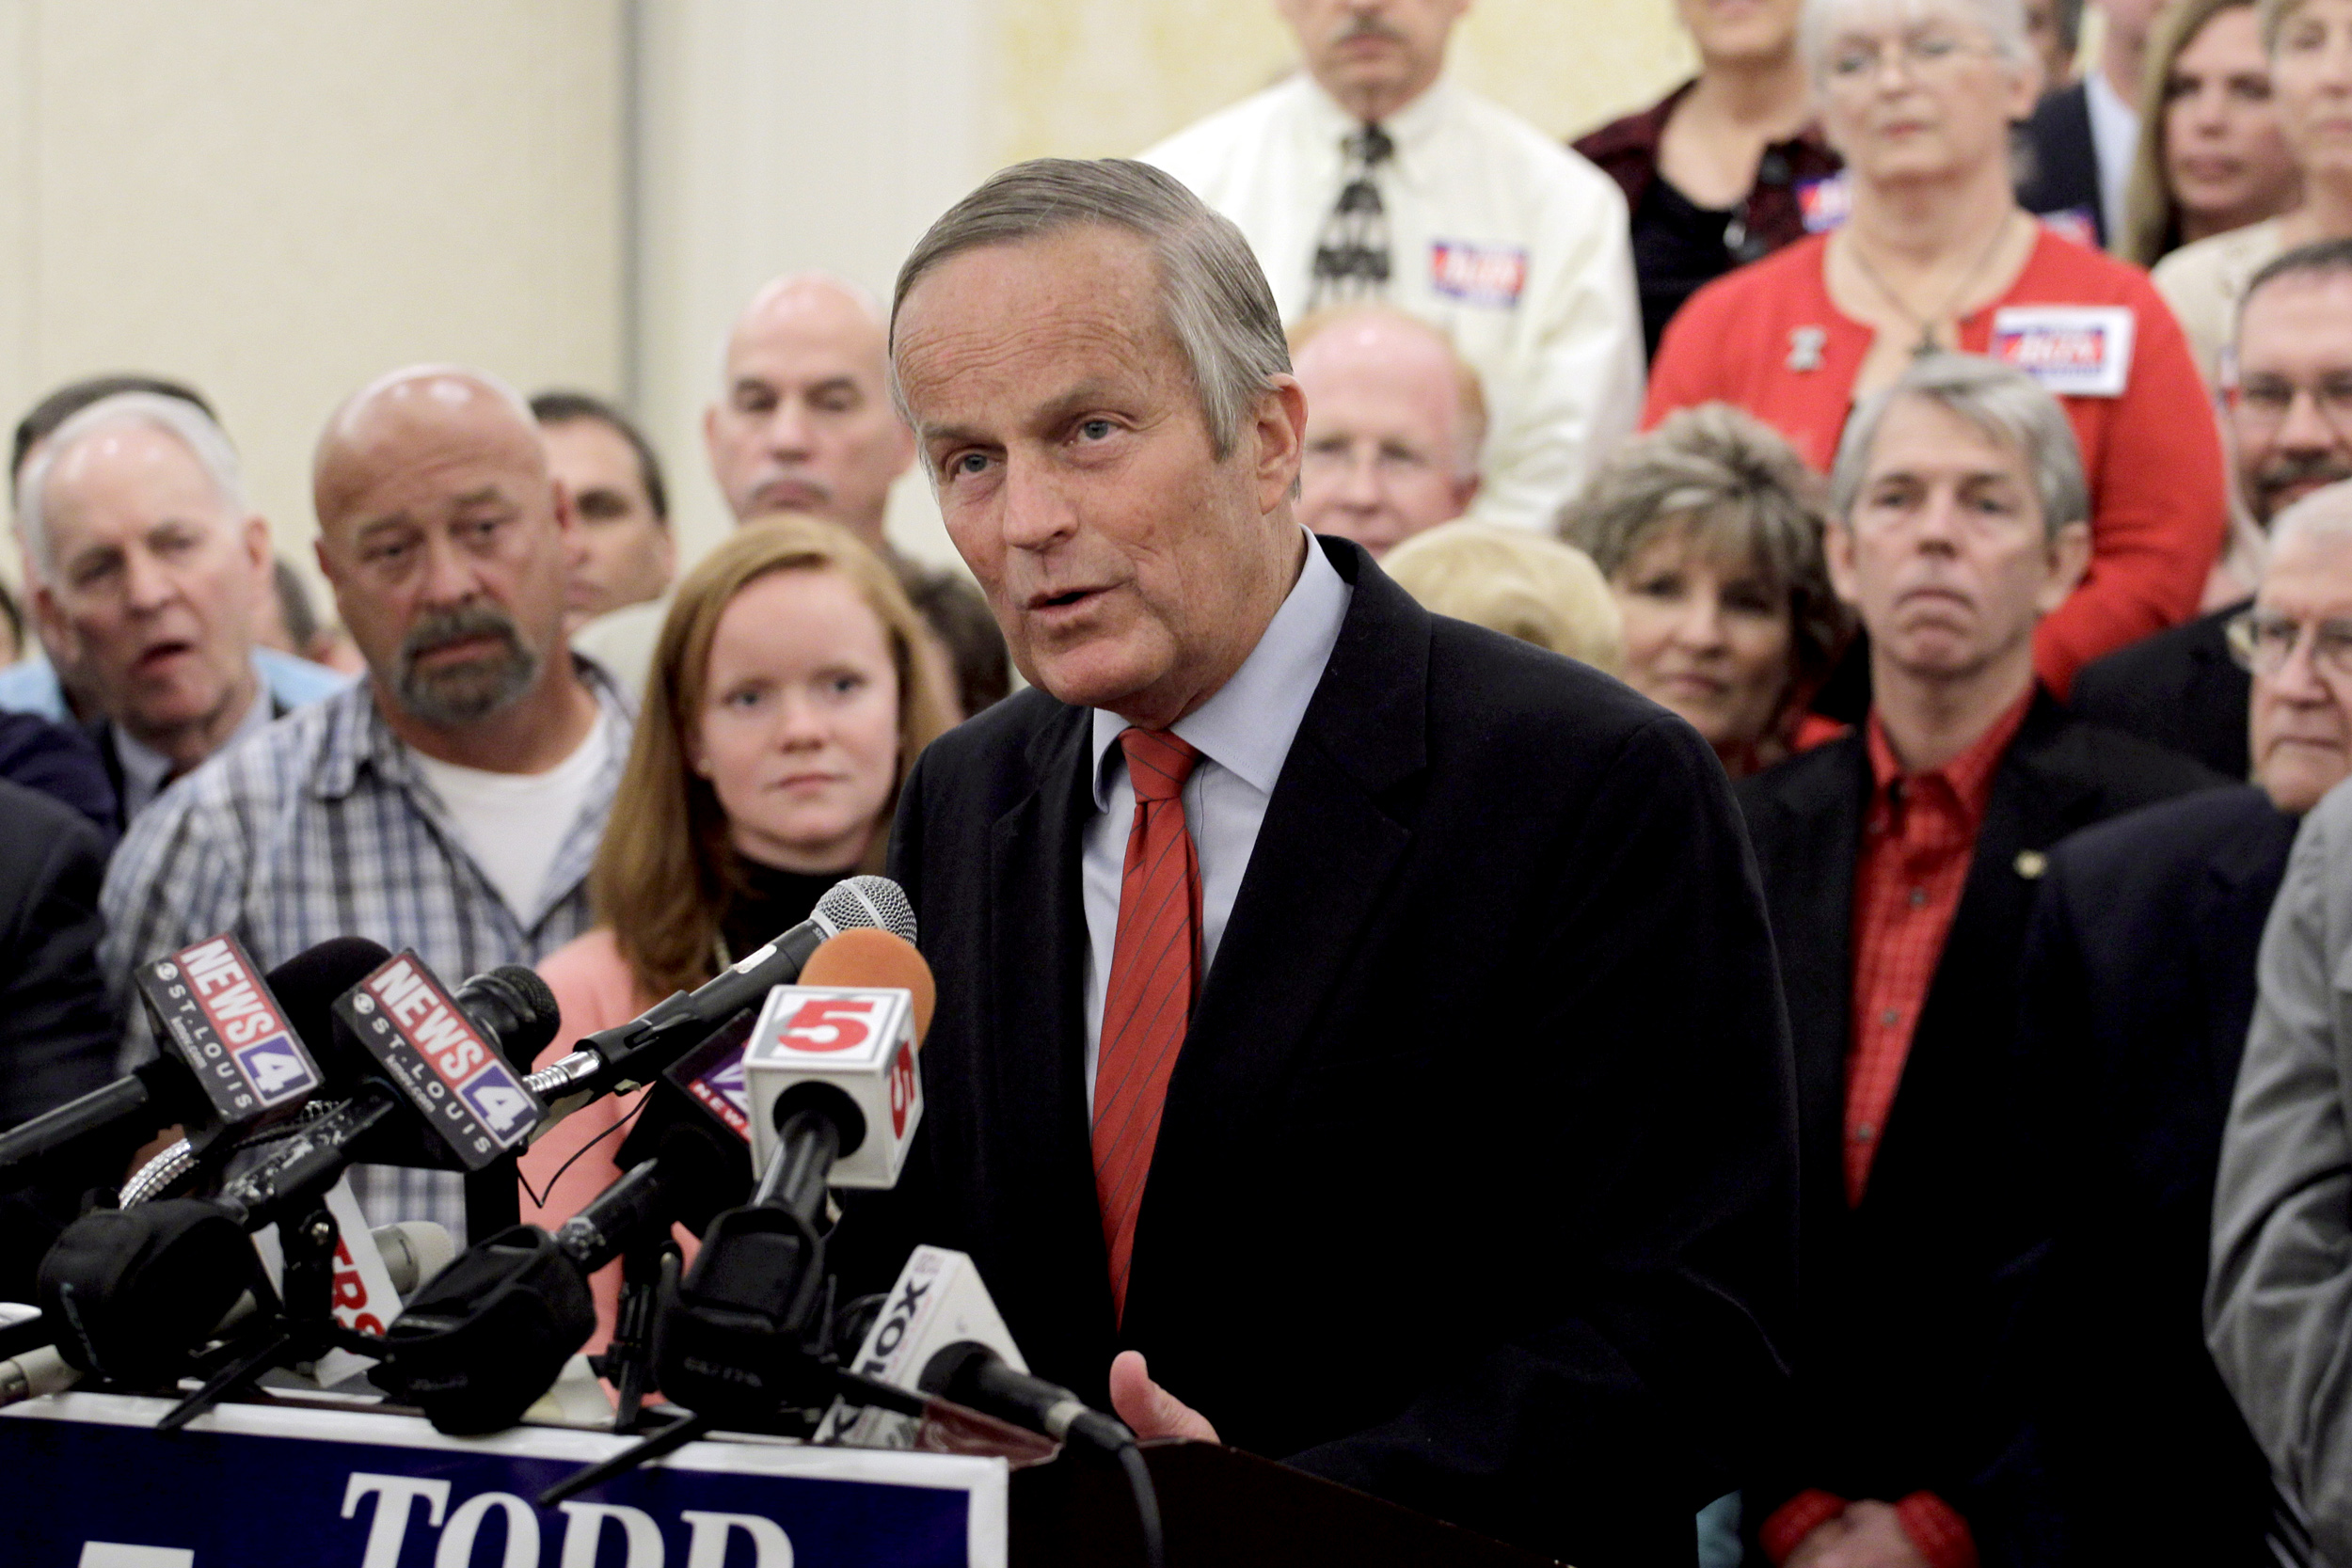 Ex-Rep. Todd Akin, sunk by 'legitimate rape' remark, dies